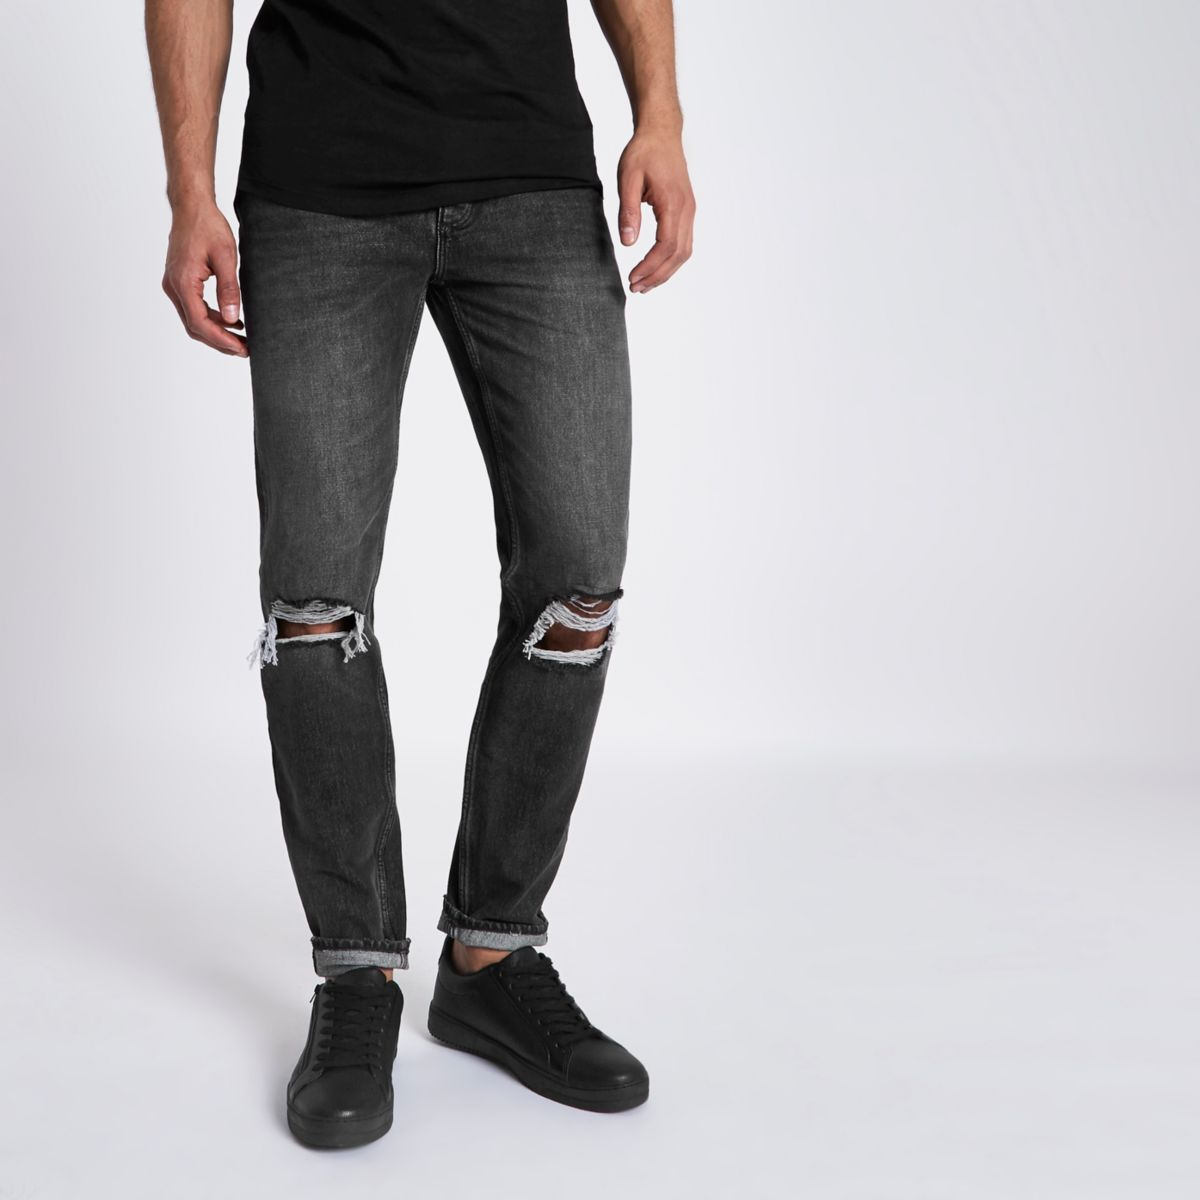 Schwarze, dehnbare Skinny Jeans im Used Look